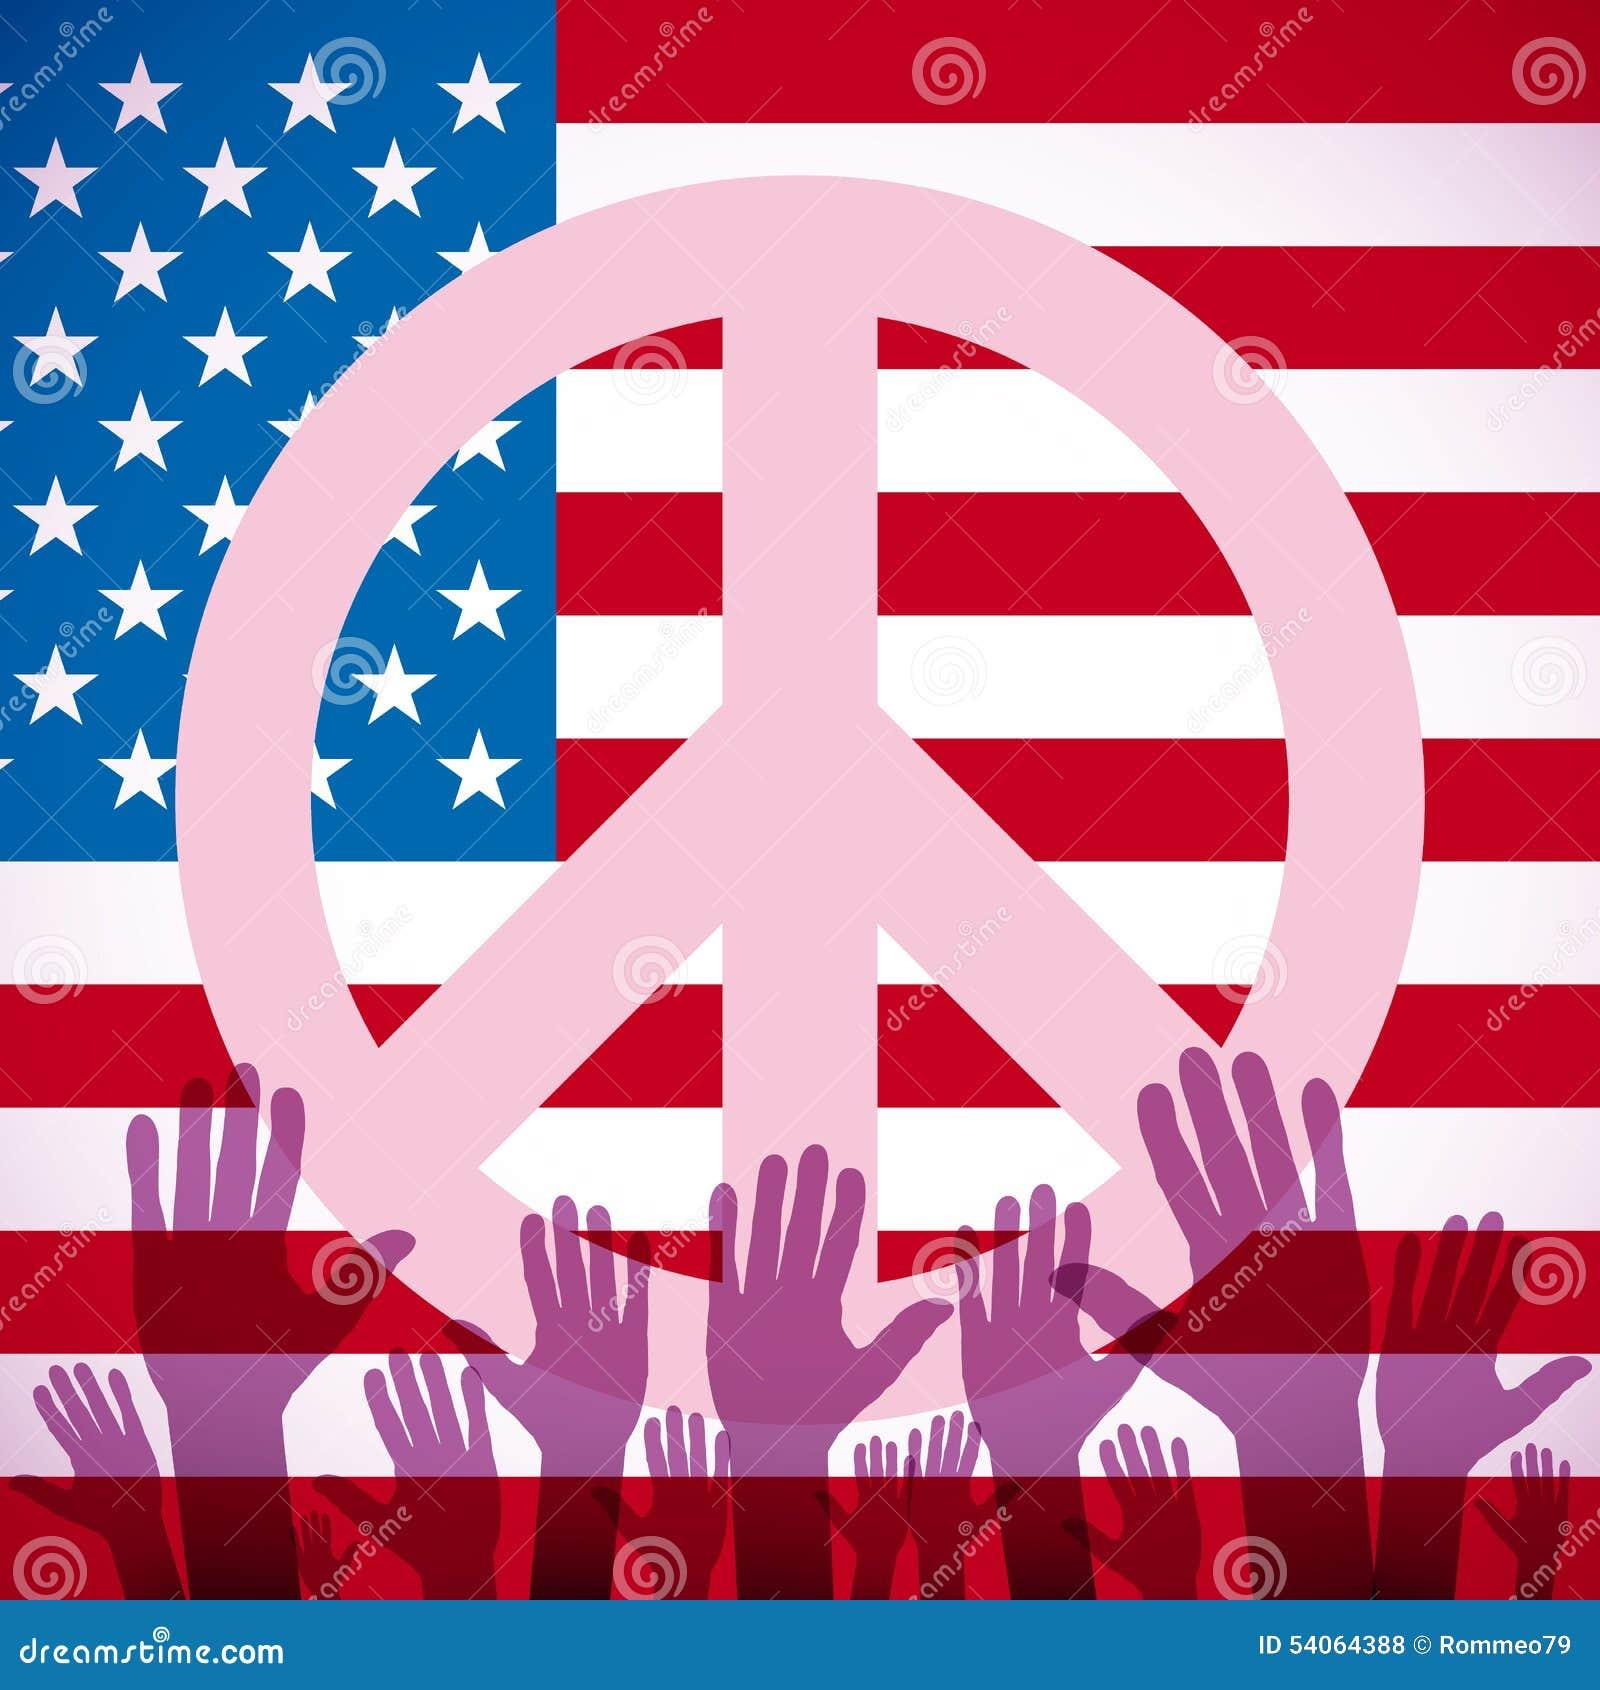 Usa peace sign stock illustration illustration of symbol 63296867 illustration long usa flag icon with peace sign royalty free stock photos biocorpaavc